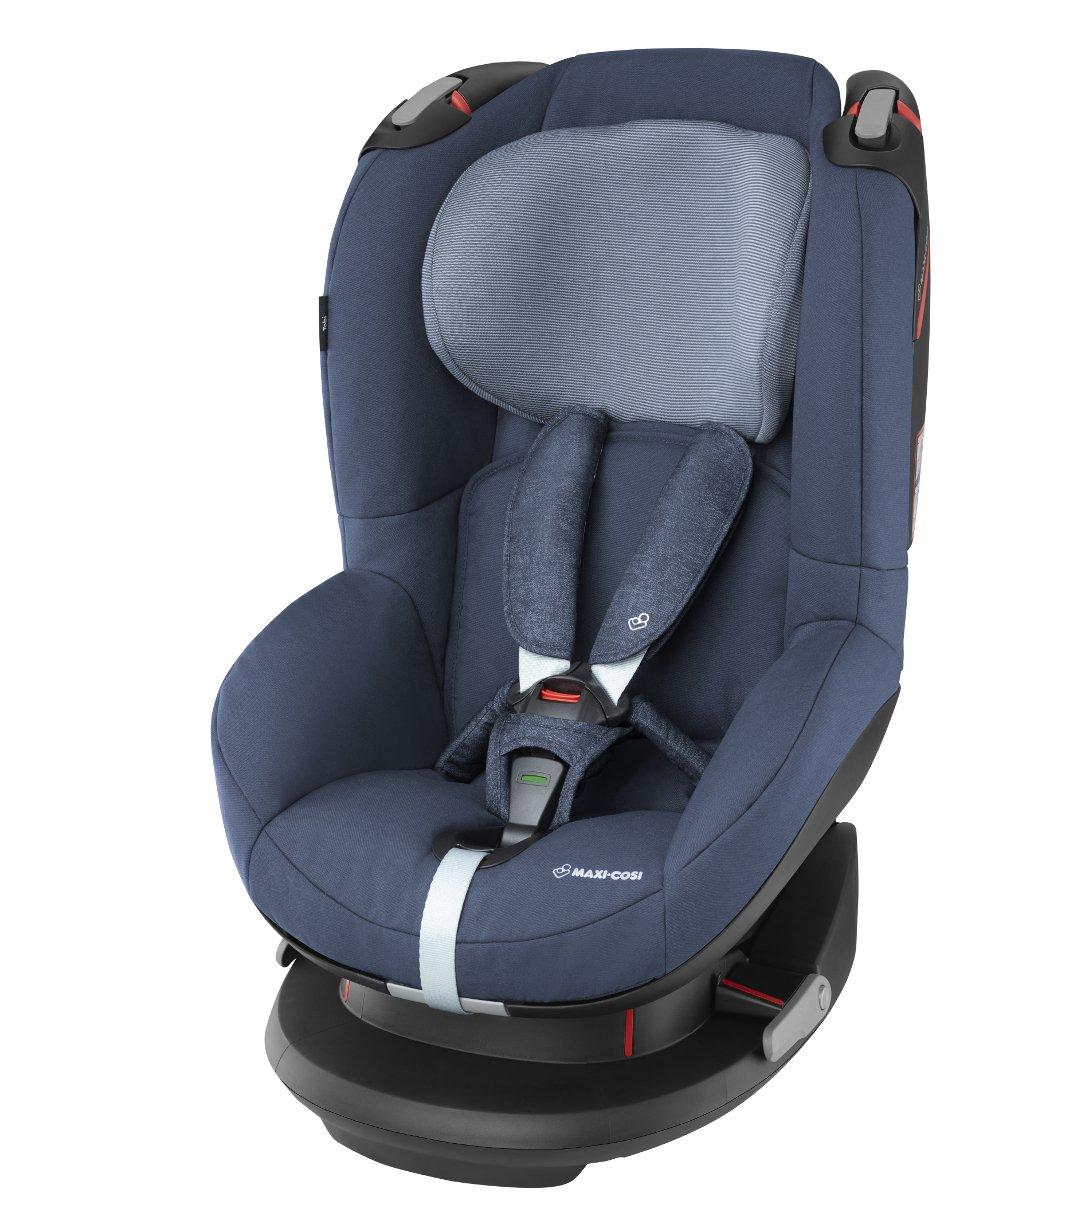 Bērnu autosēdeklis 9-18 kg MAXI-COSI Tobi Nomad Blue